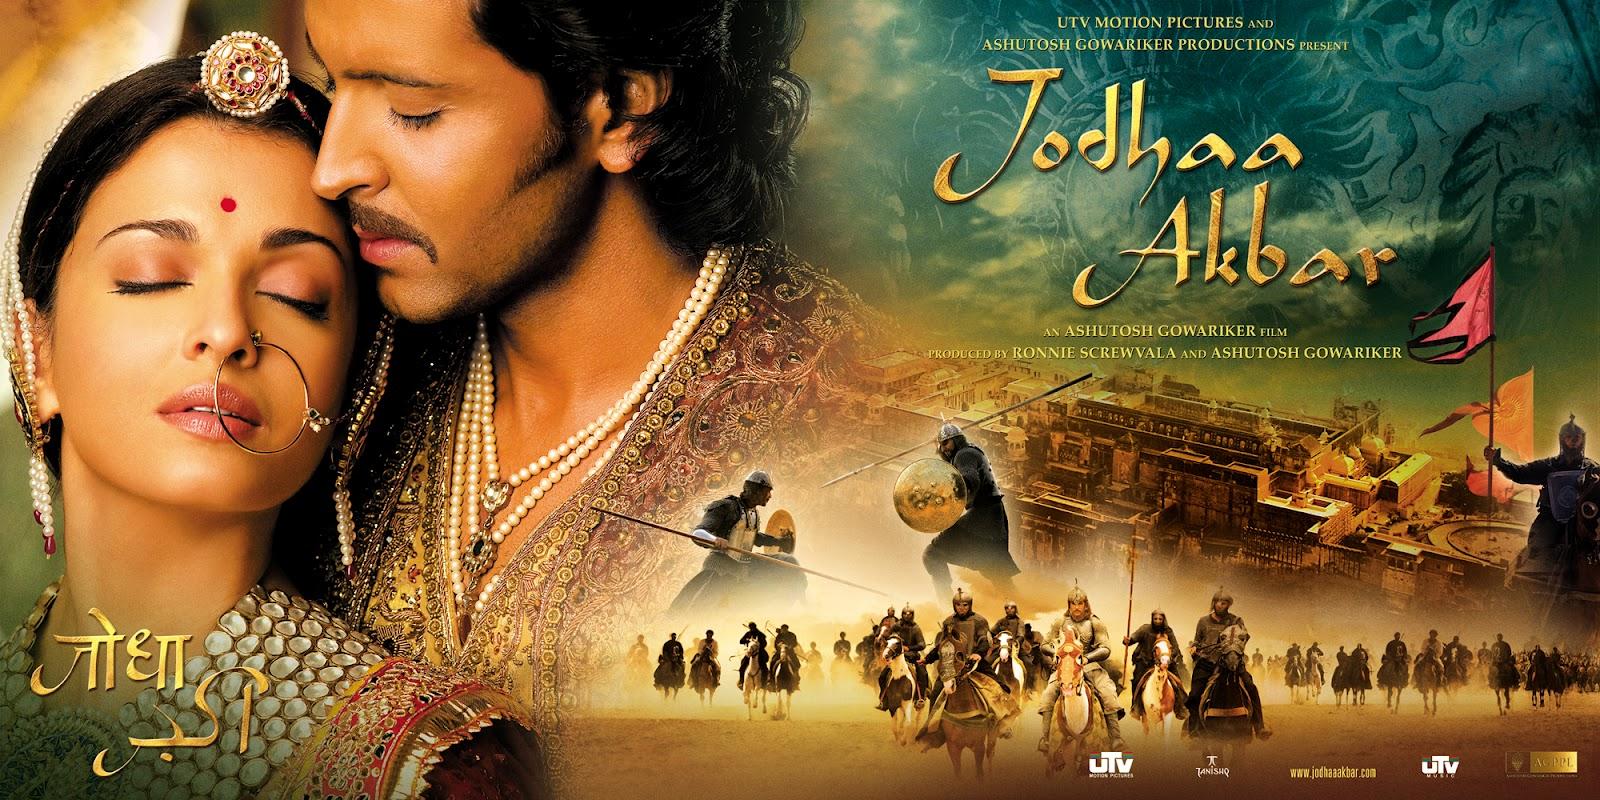 Jodhaa Akbar 2008 Bluray Rip 720p Download News Online